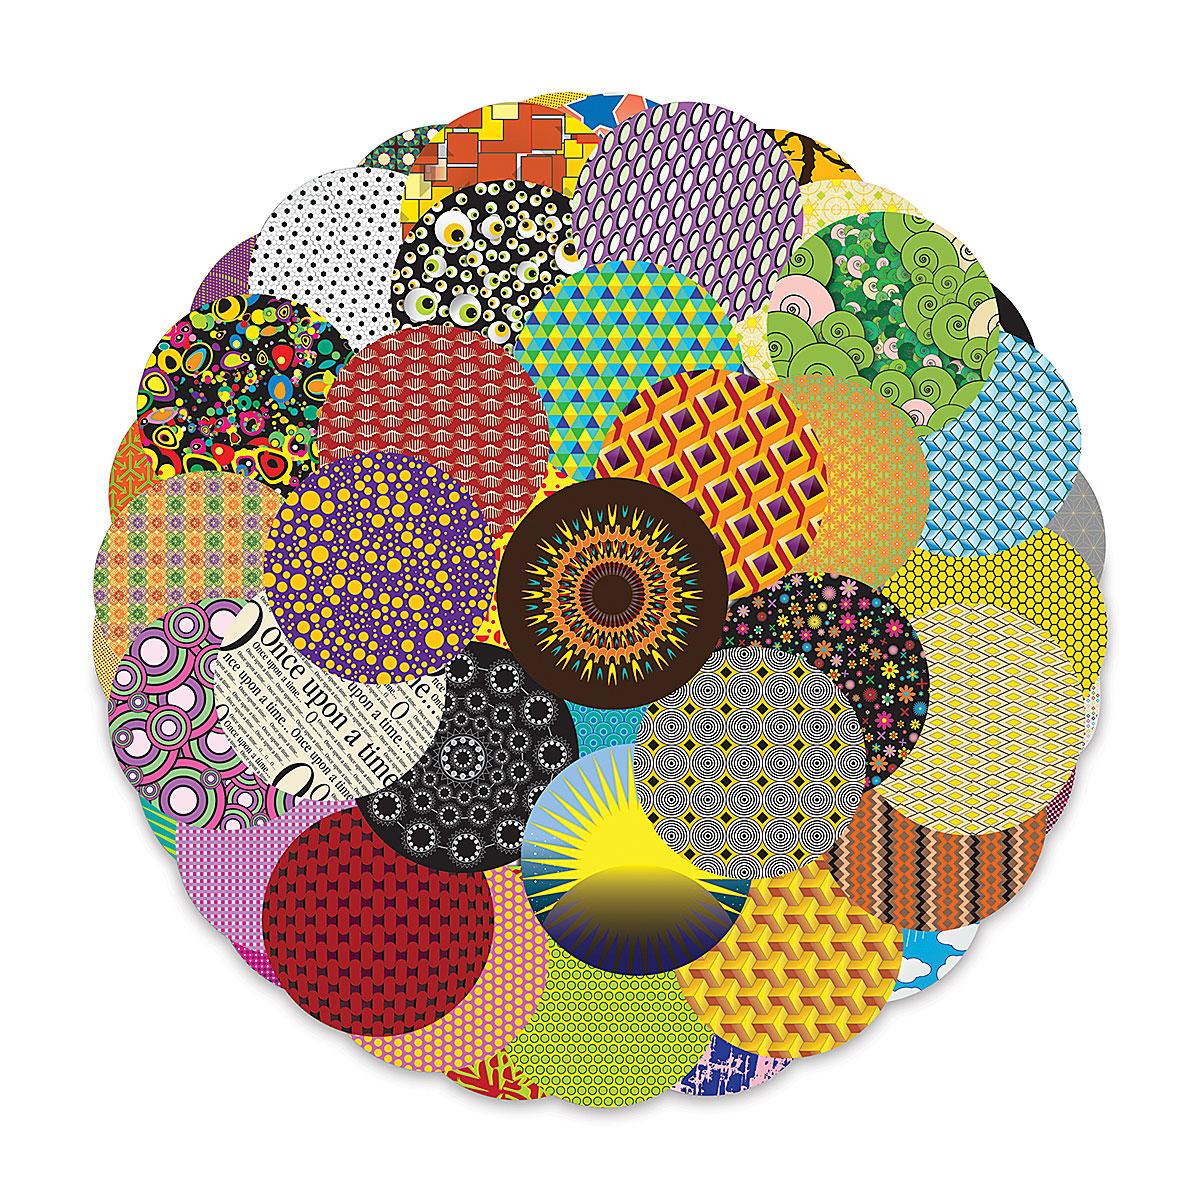 Roylco Crafty Circles - 5 circles, Pkg of 144